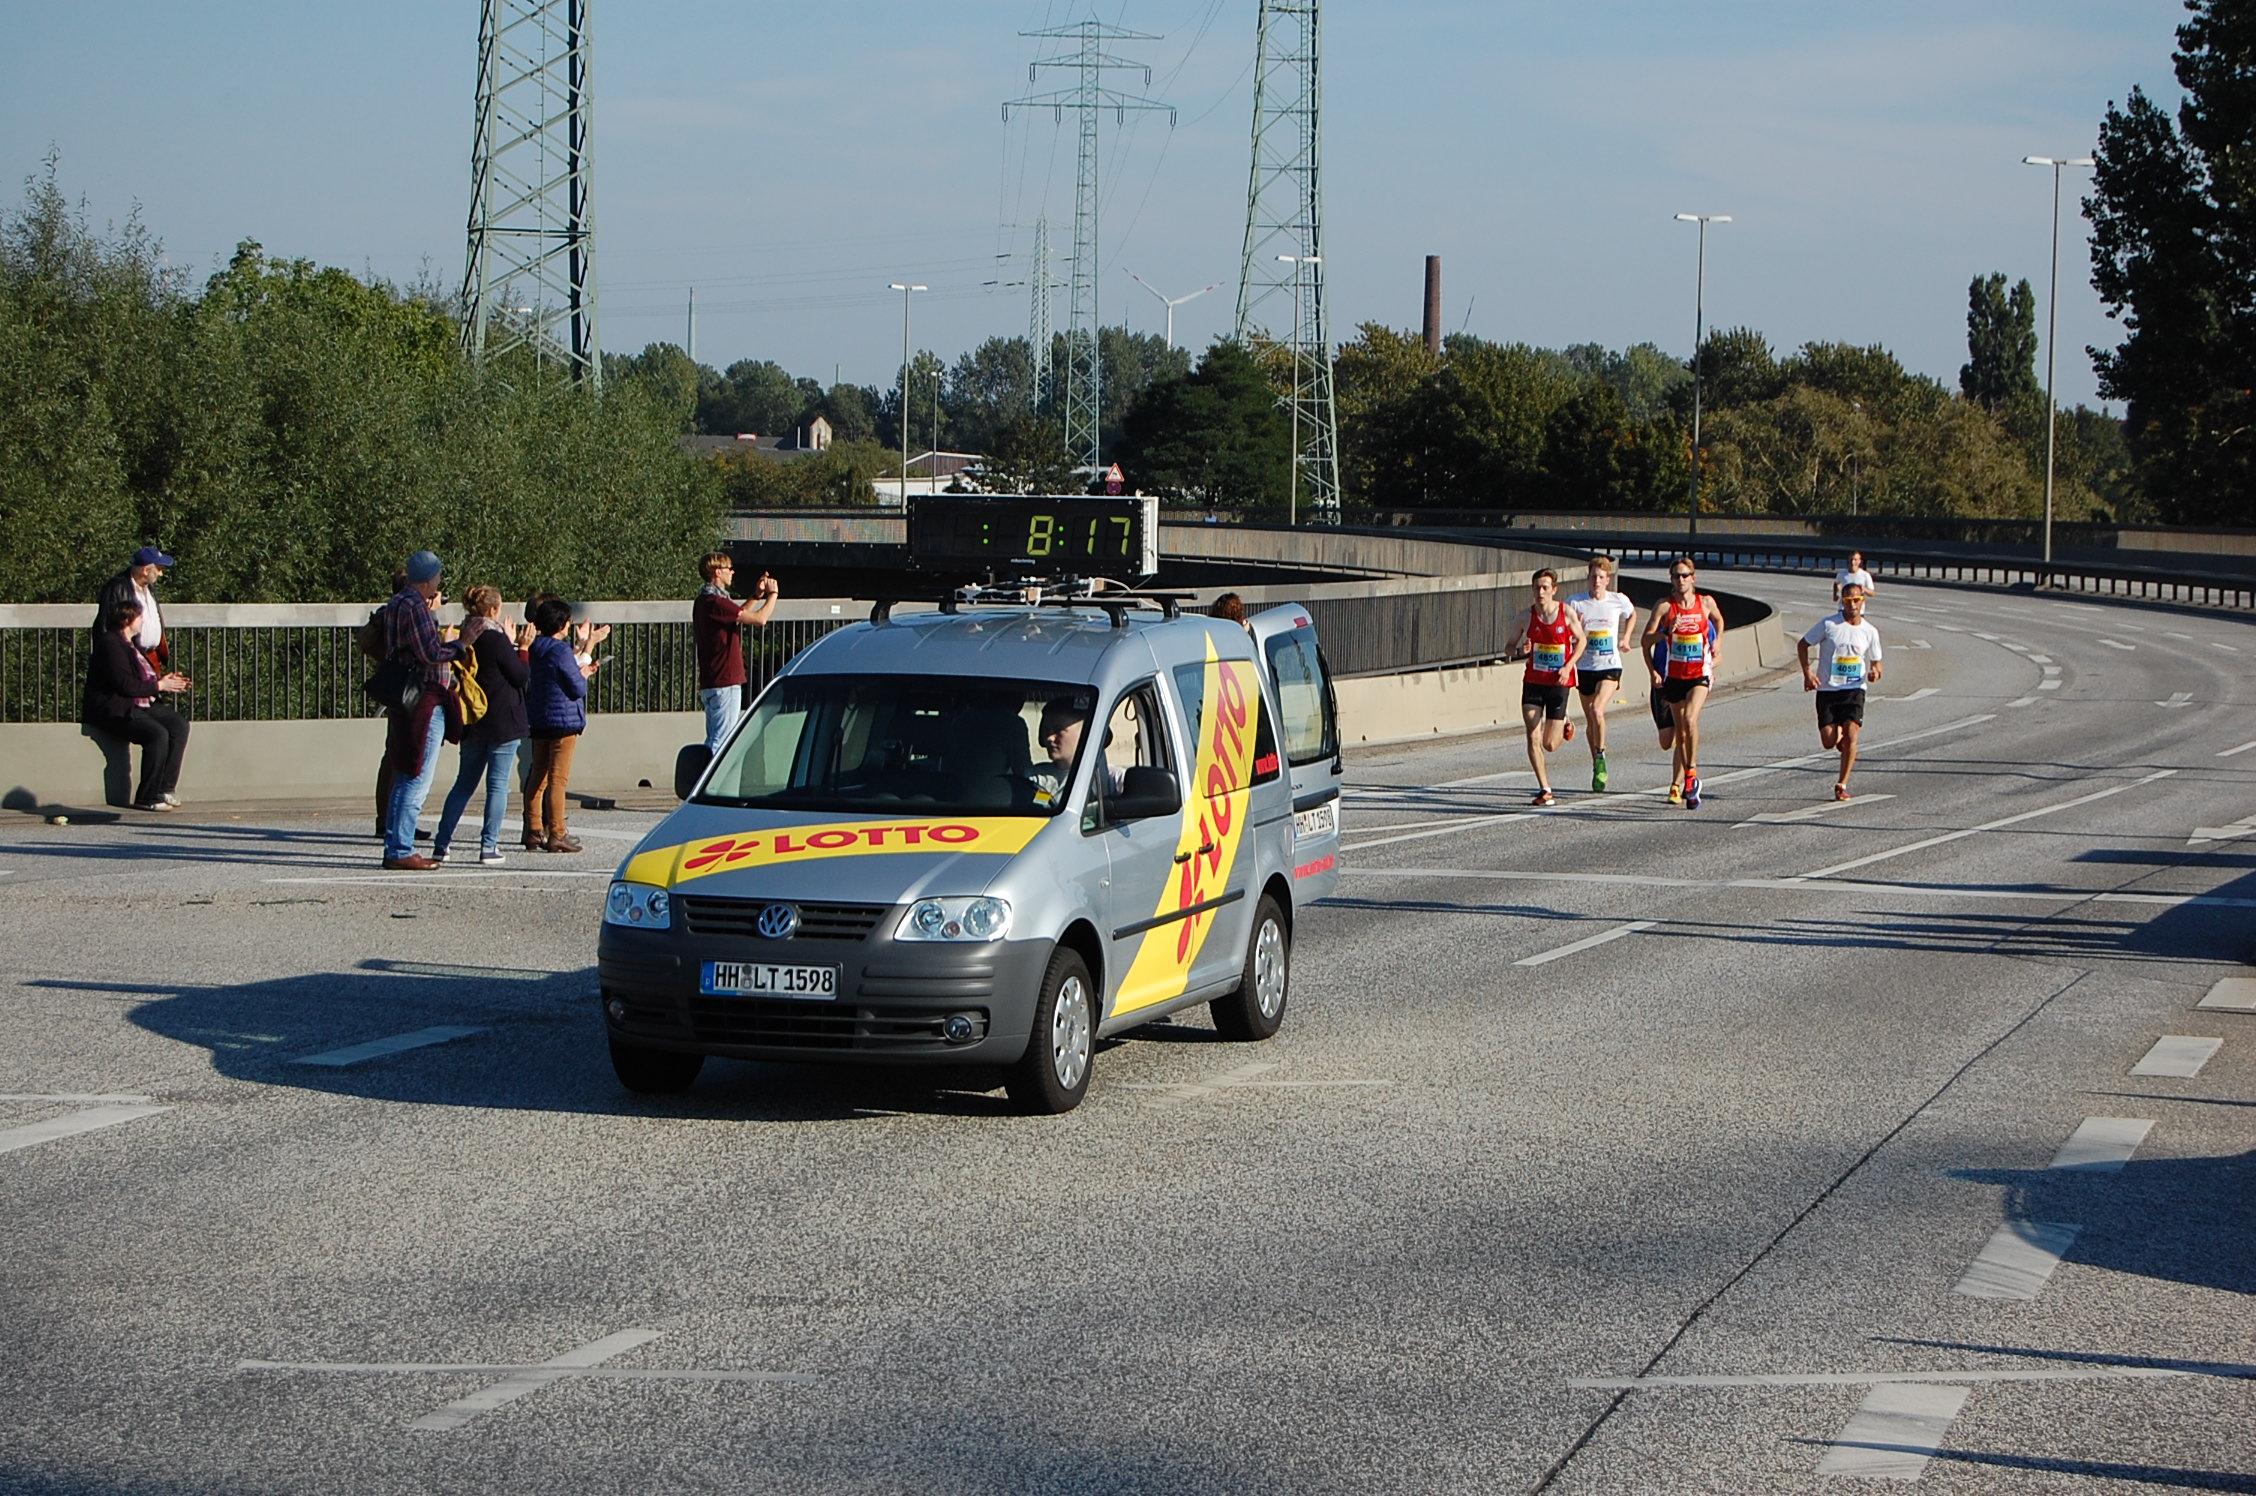 5. Köhlbrandbrückenlauf: Läufer Lauf 2 bei km 2,5 (Beginn der Brückenrampe)